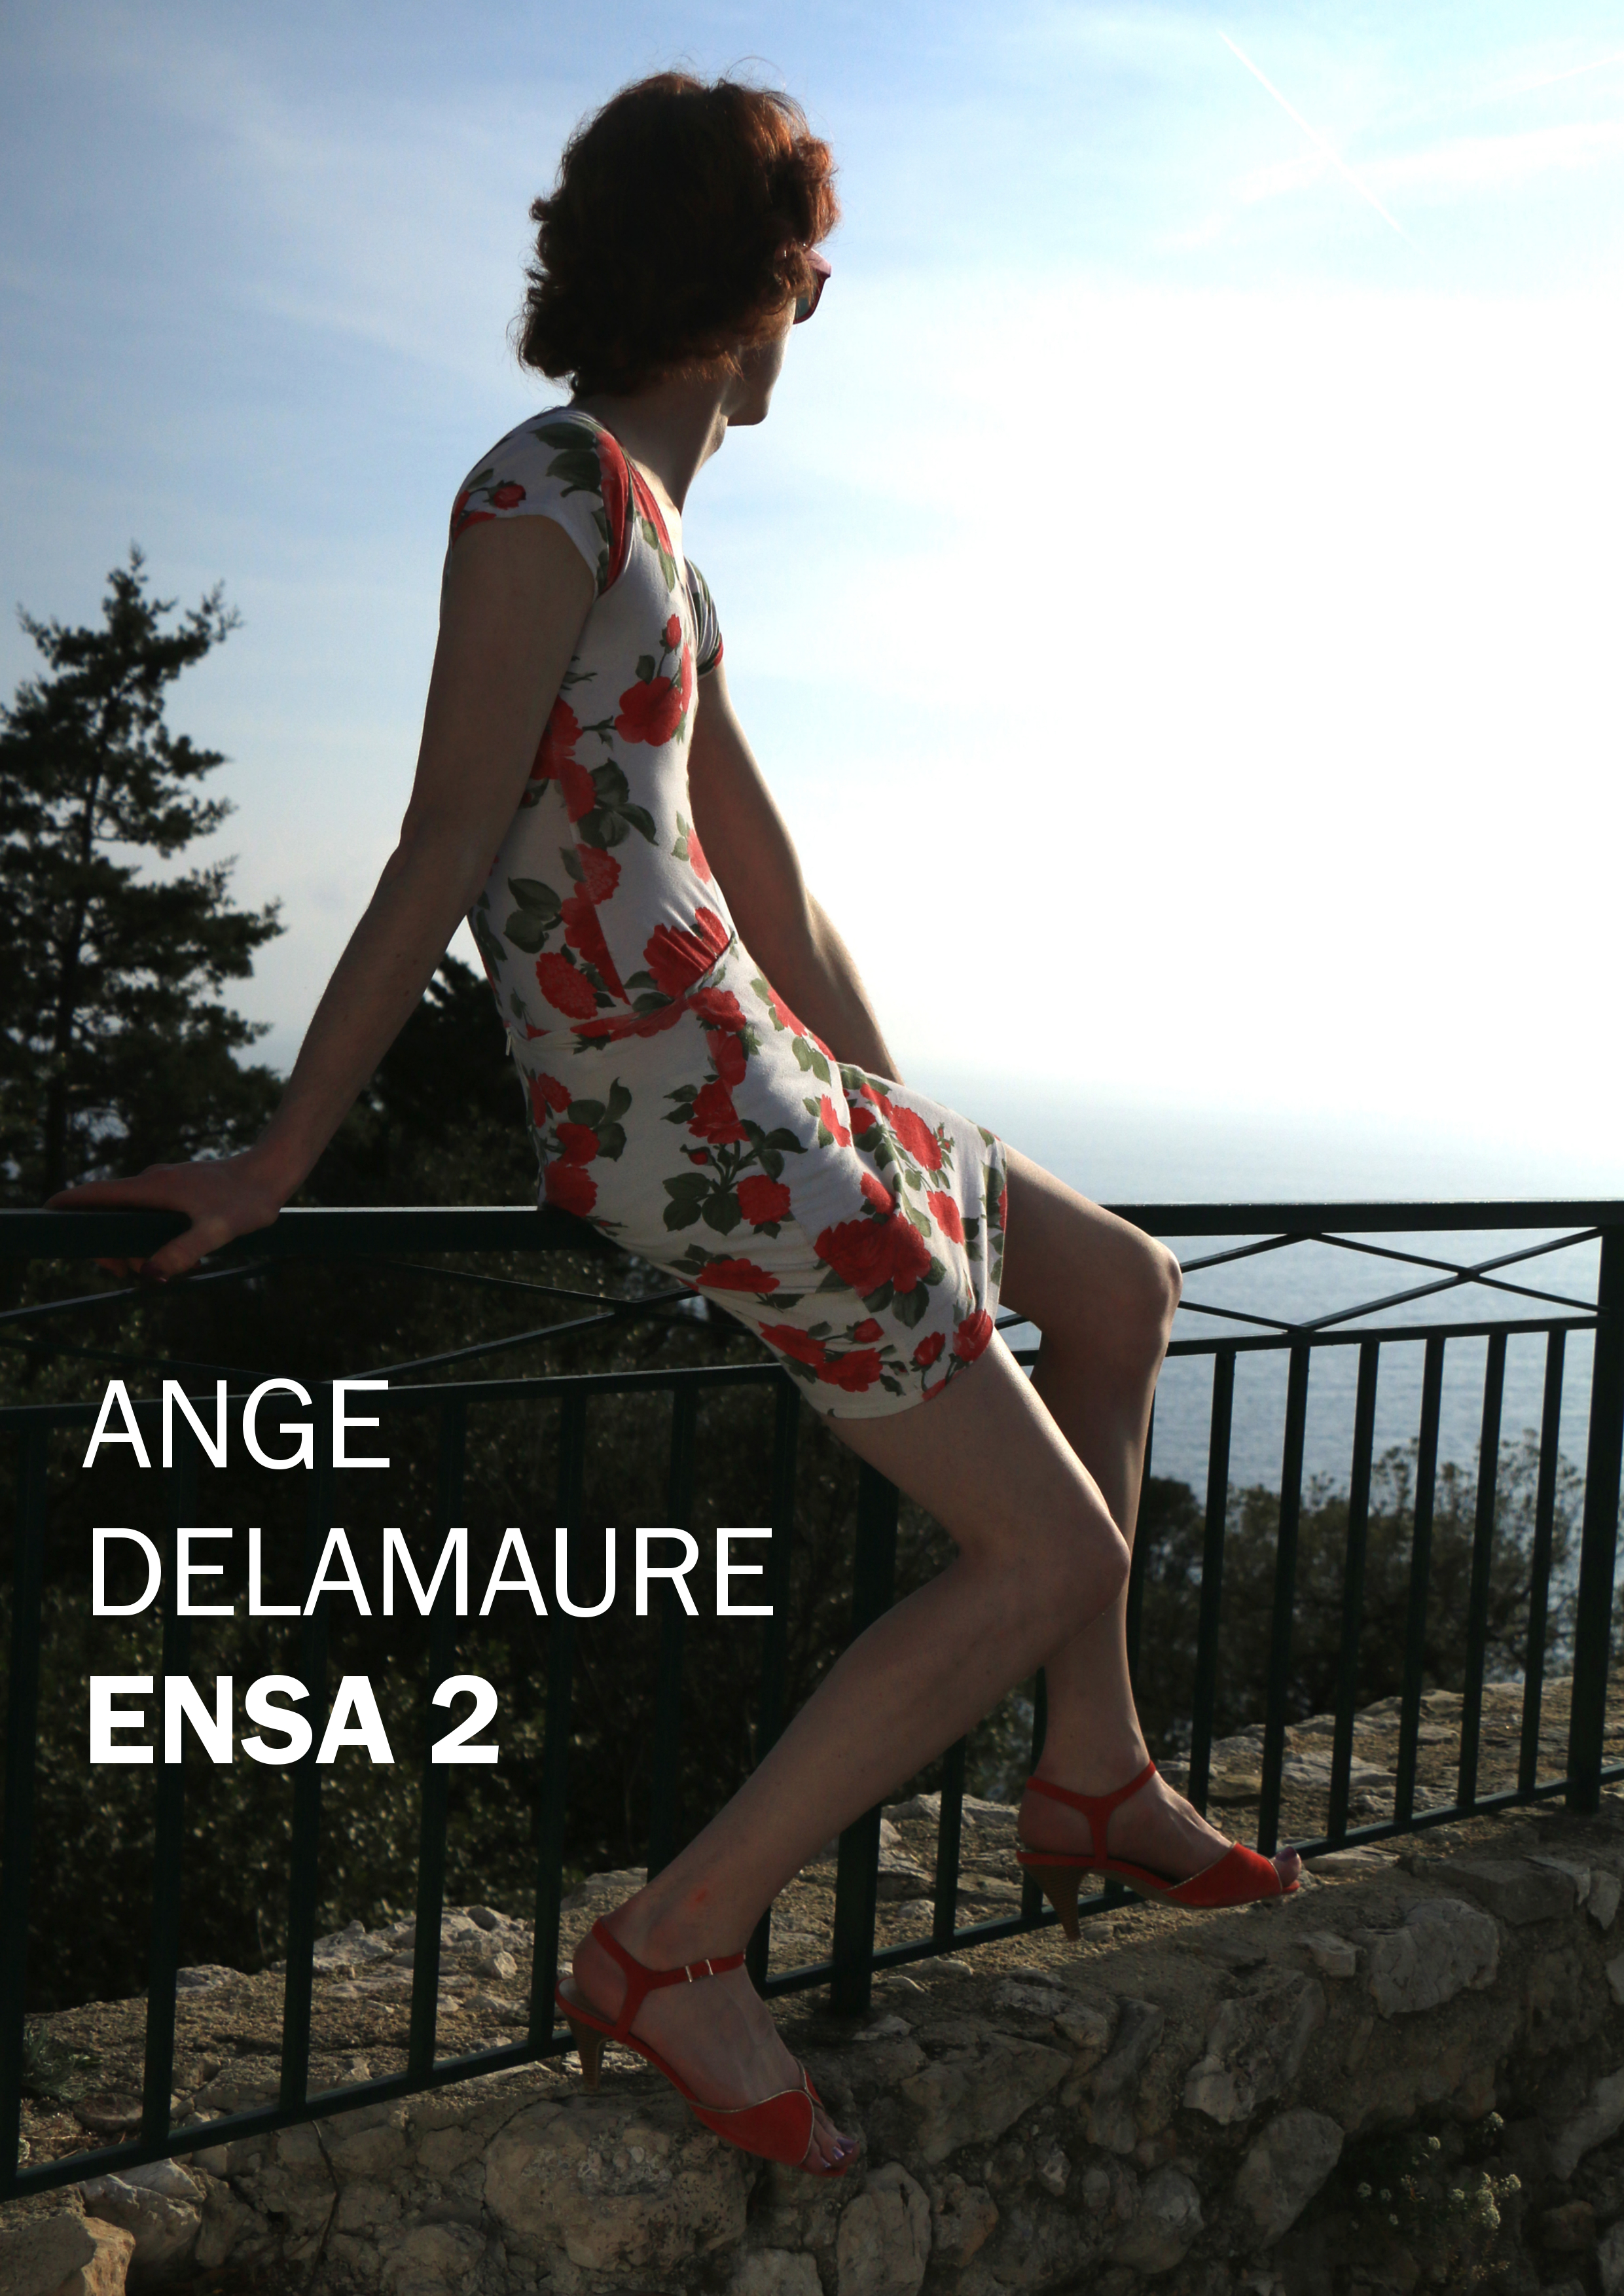 ENSA 2